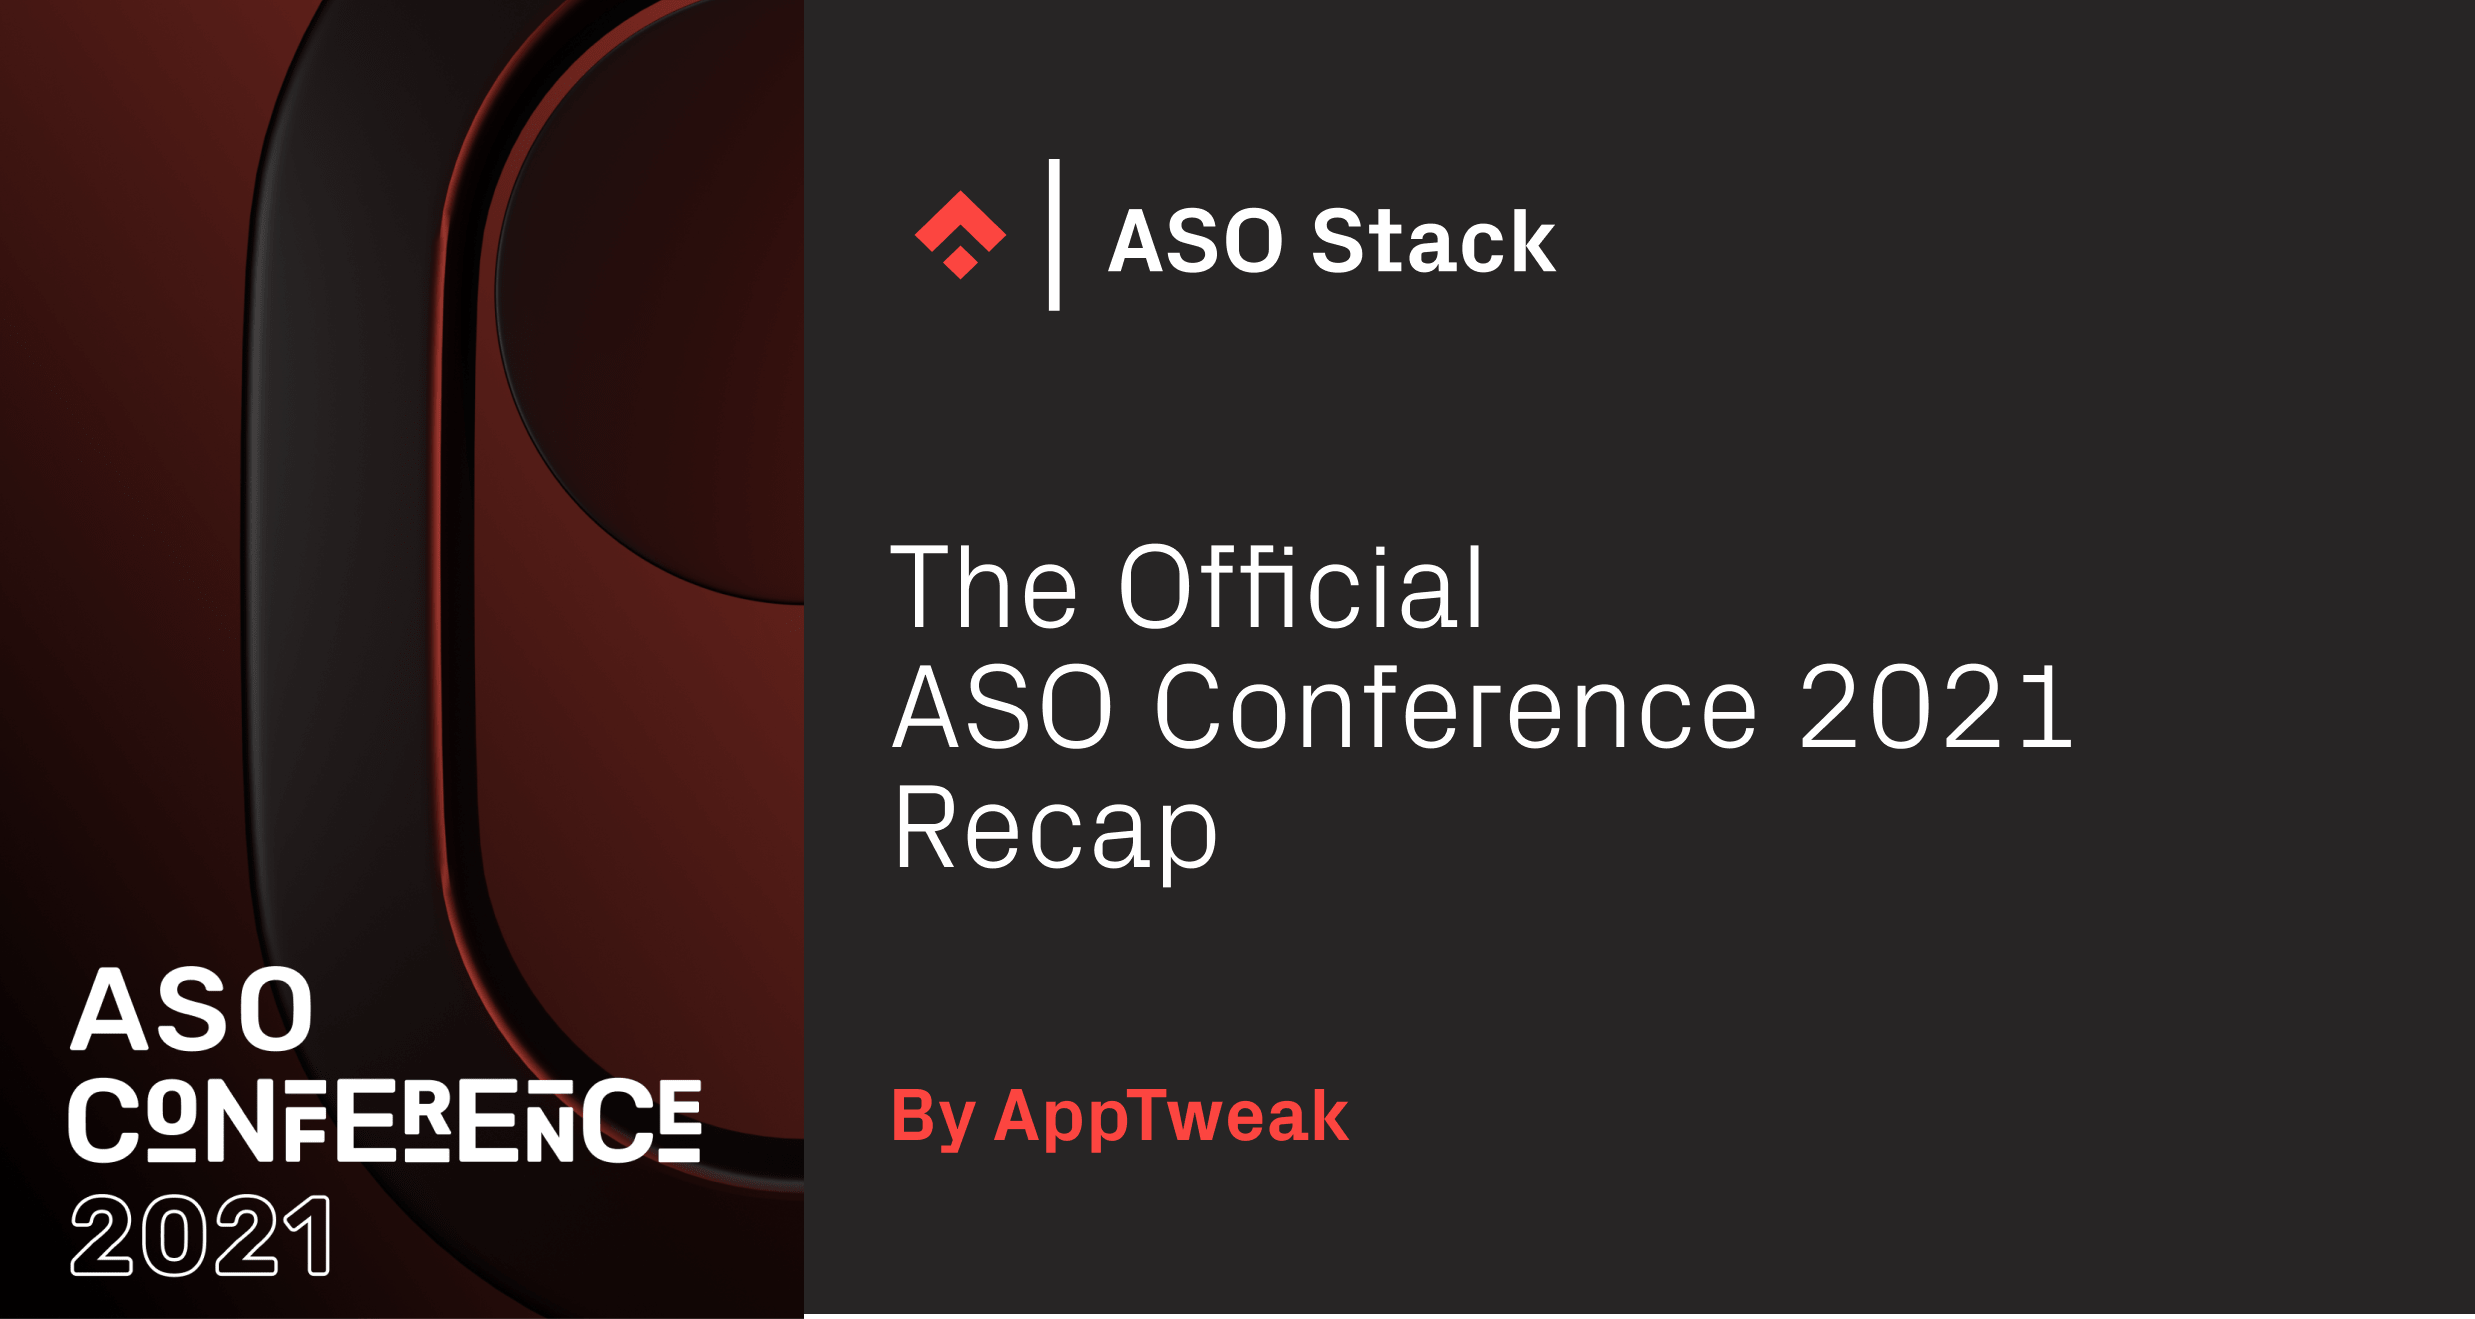 The official aso conference 2021 recap